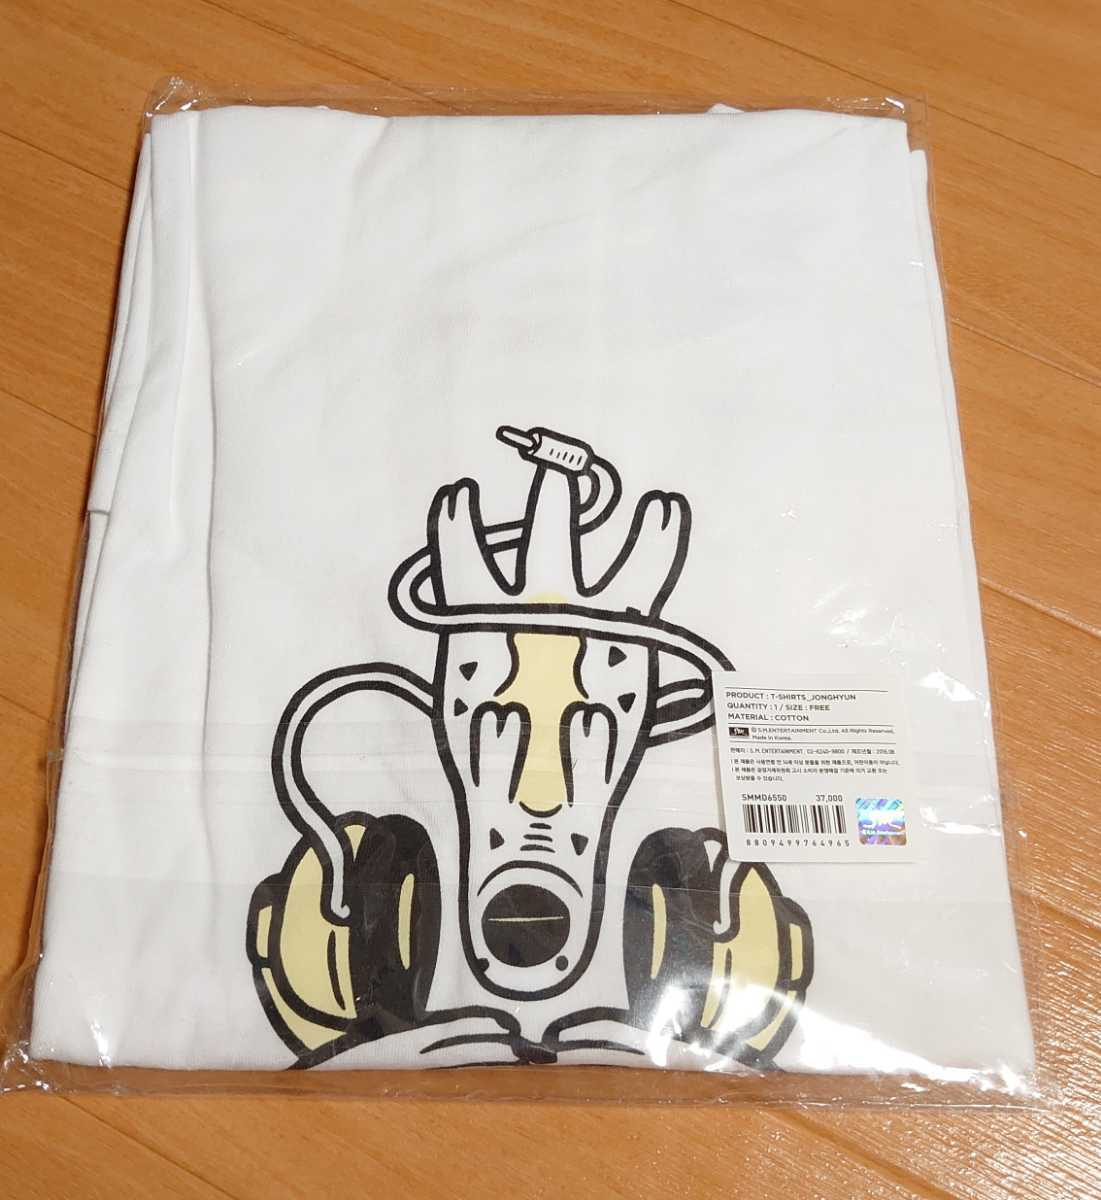 SHINee WORLD V 公式 Tシャツ【ジョンヒョン/JONGHYUN】新品未開封 フリーサイズ 韓国_画像2